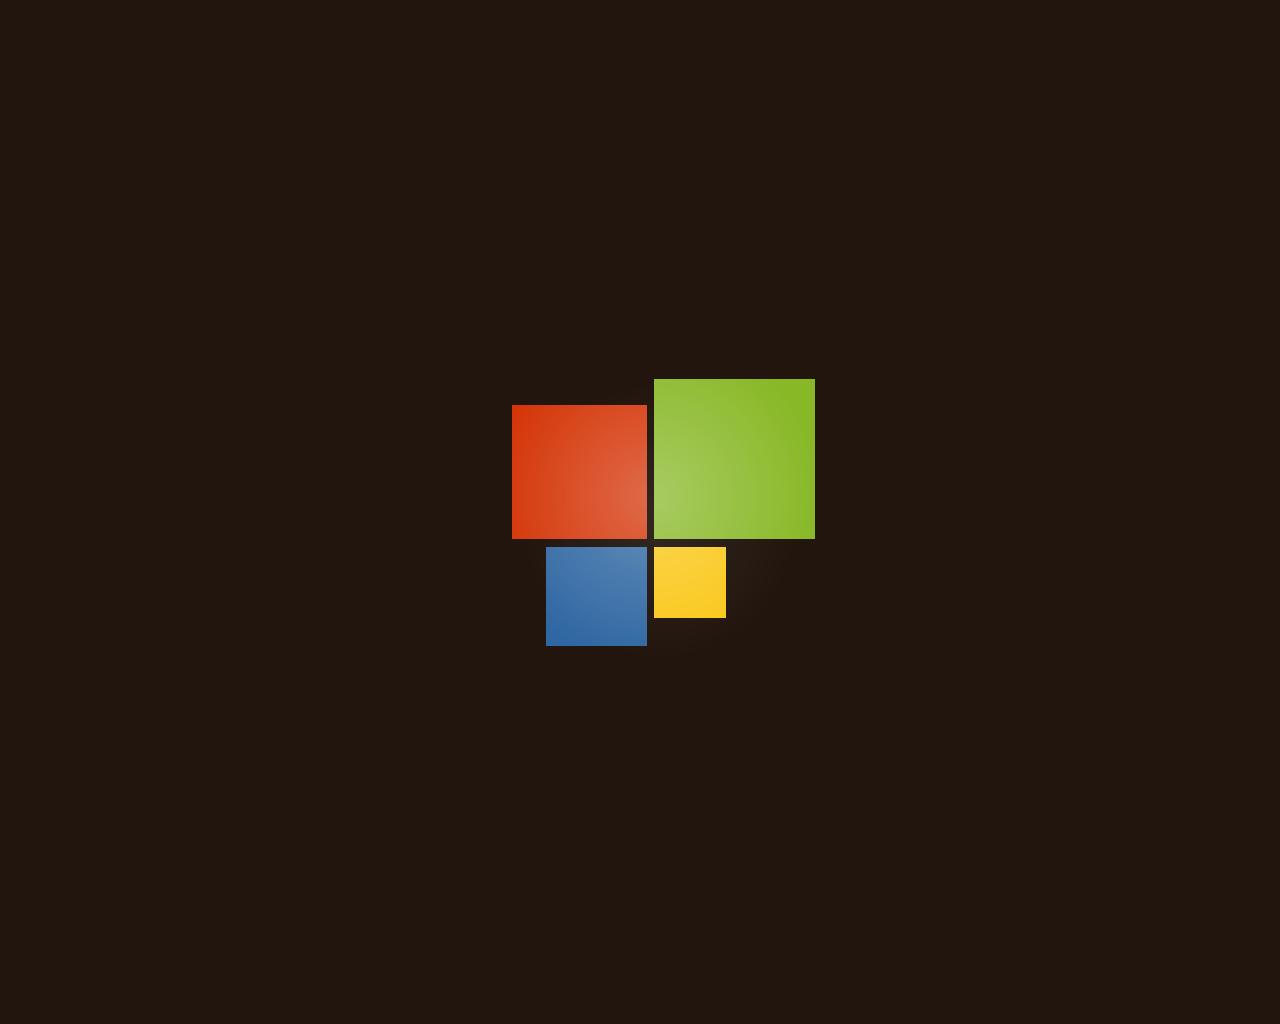 Minimalist Windows Wallpapers - Top Free Minimalist Windows